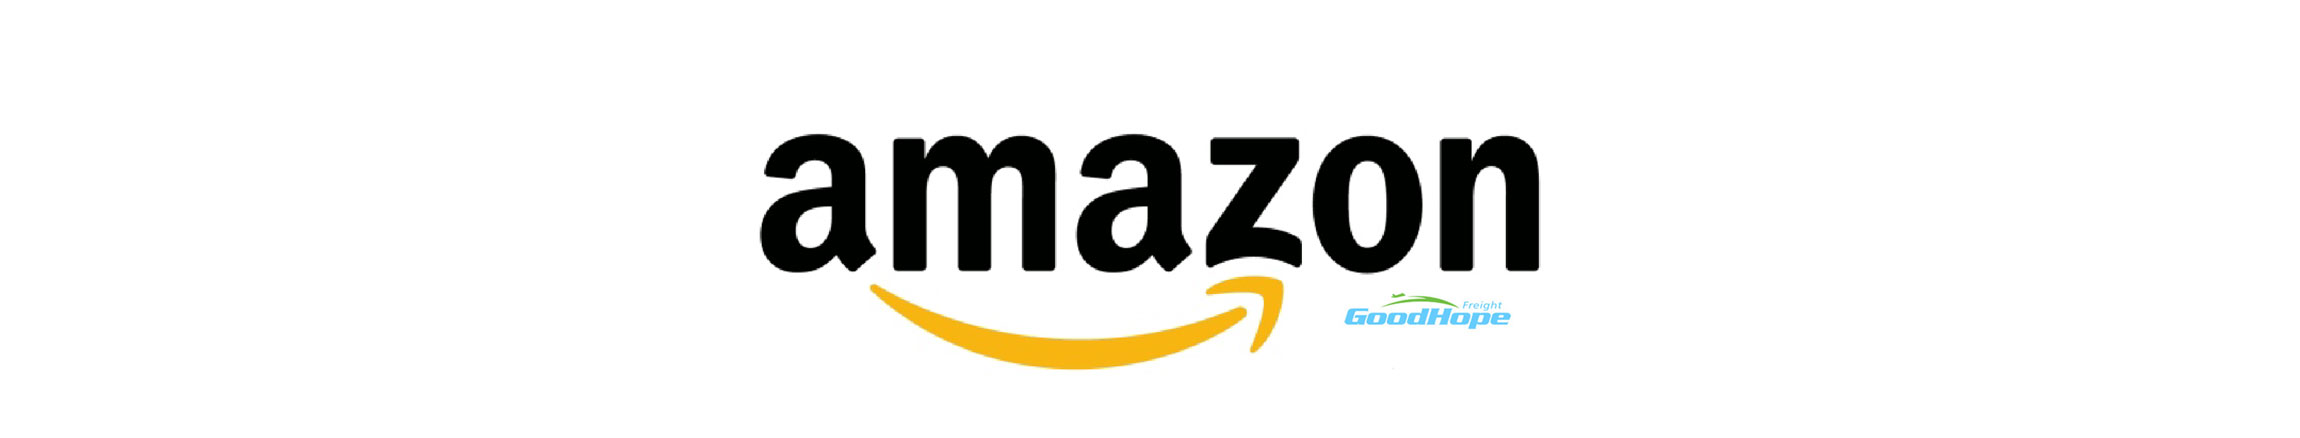 Amazon Com Shipping Europe